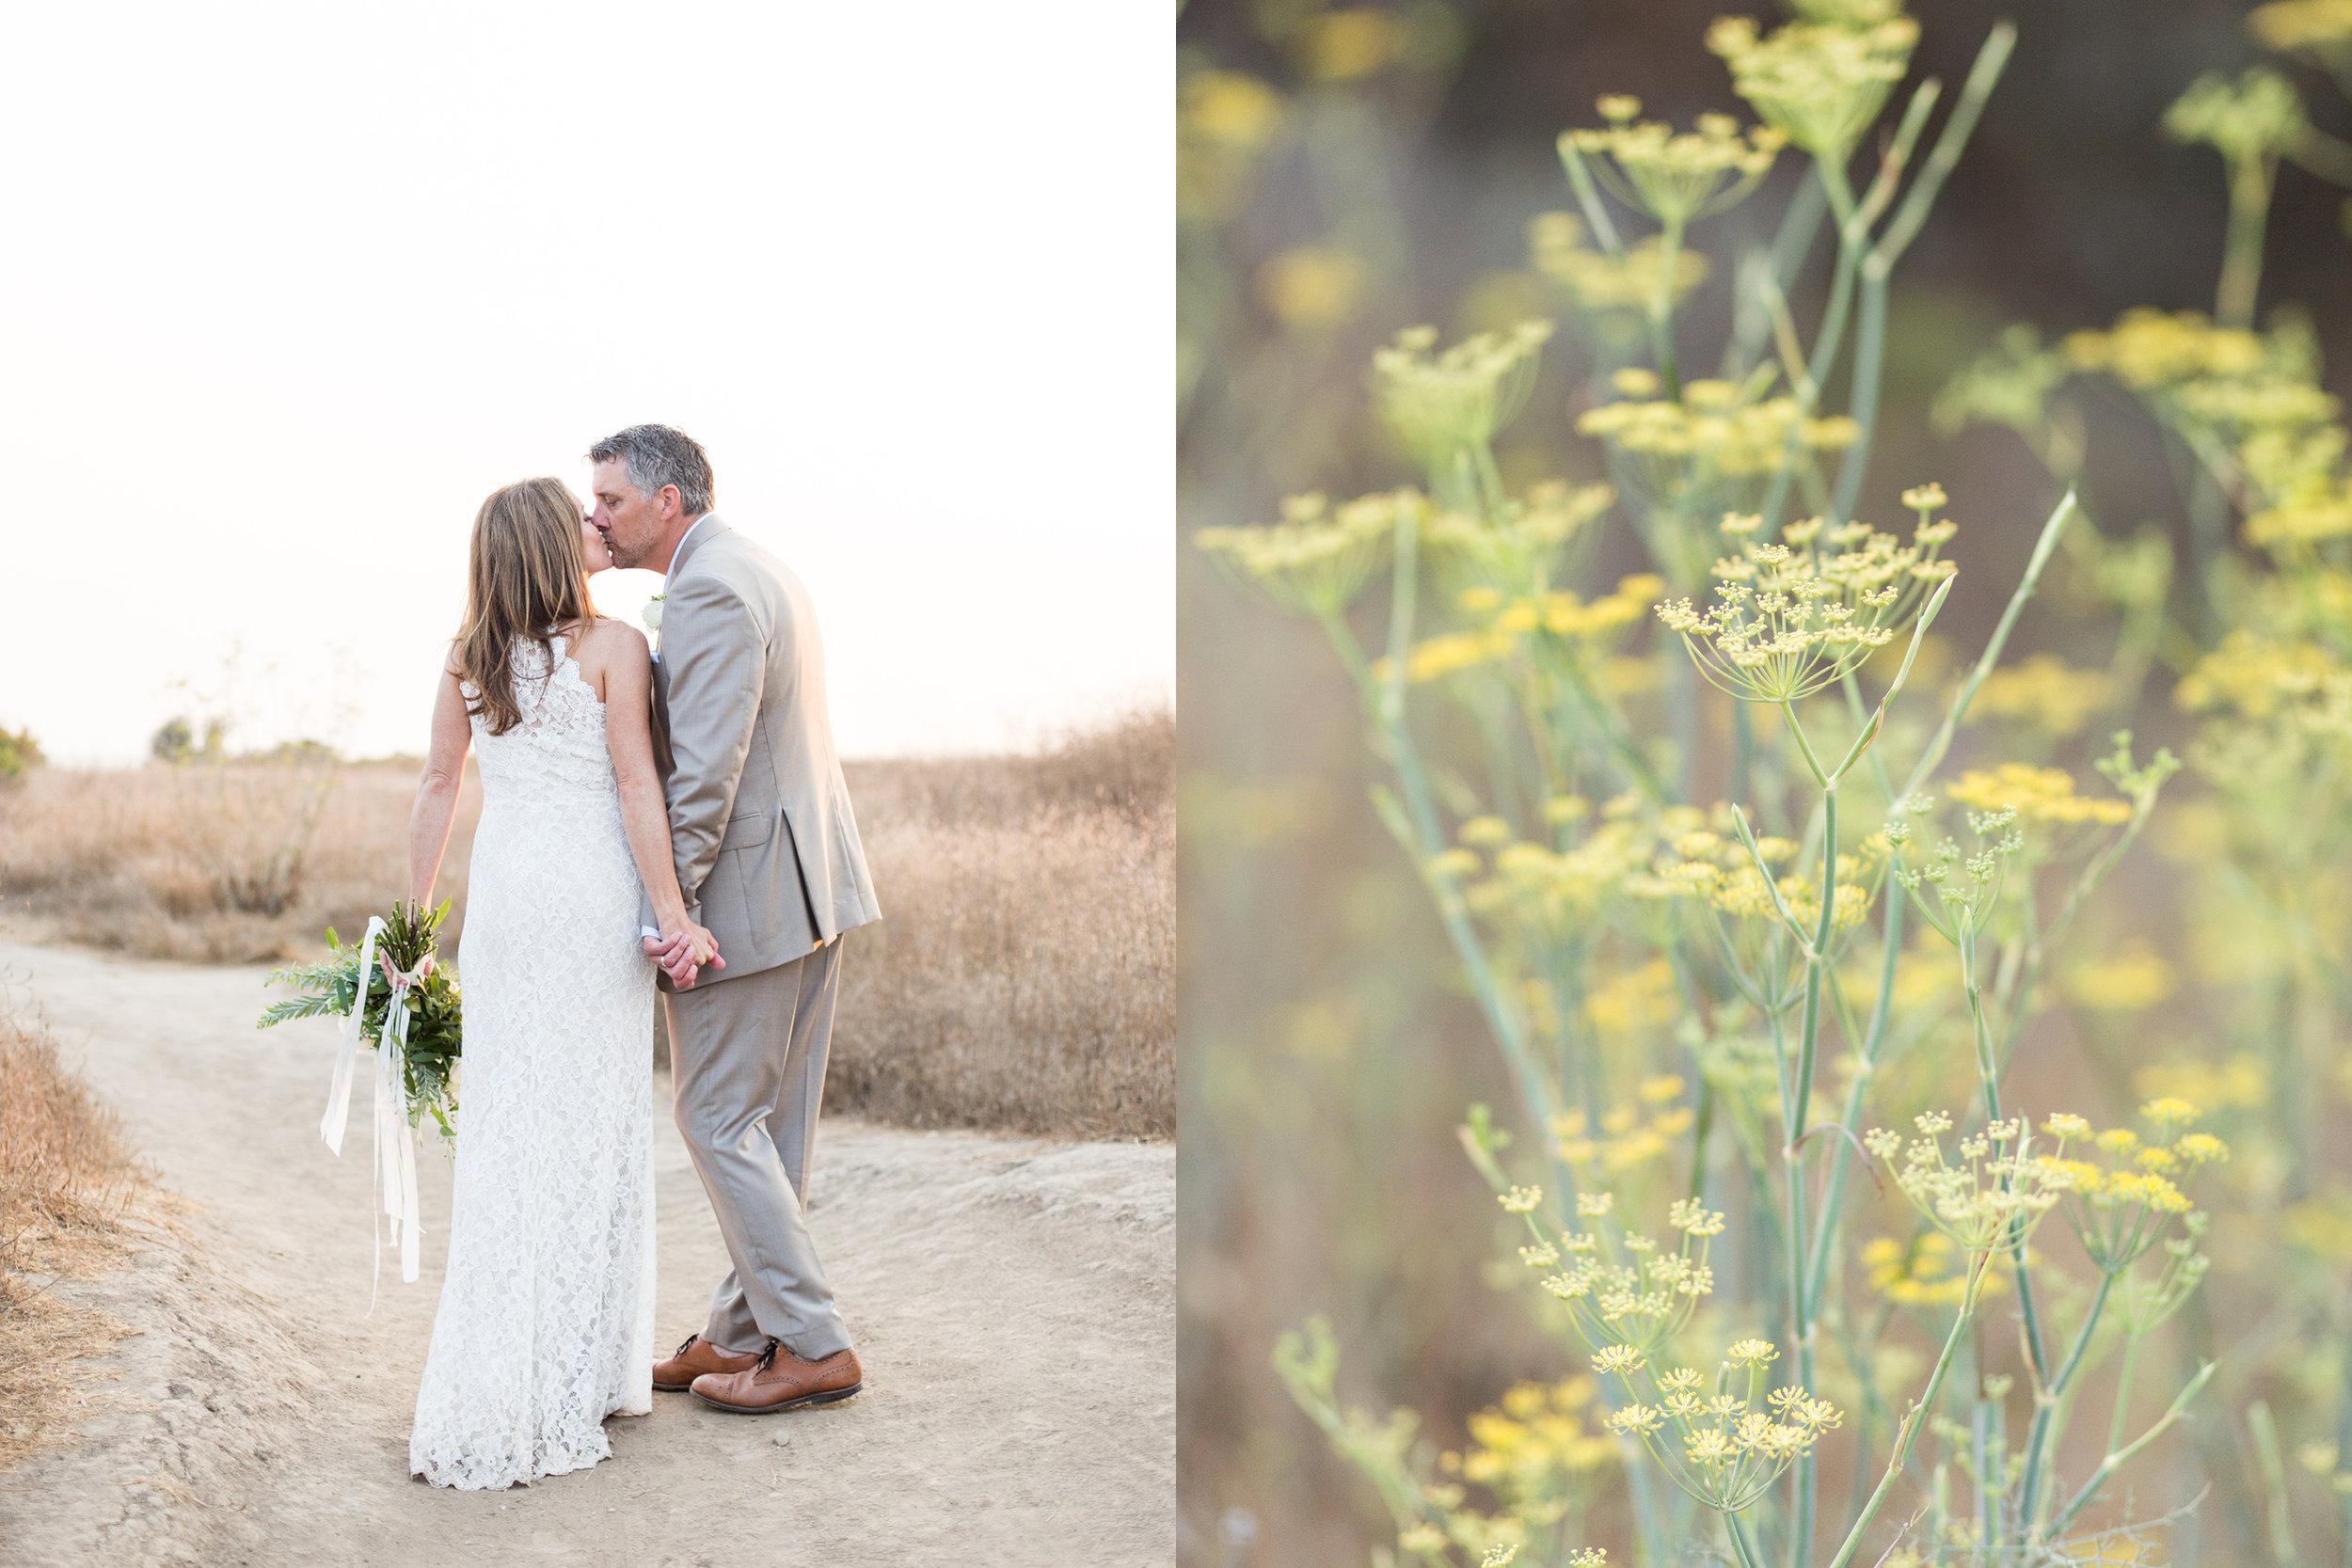 santa-barbara-elopement-elope-wedding-planner-coordinator-coordination-day-of-intimate-rustic-ellwood-bluffs-forest-beach-ocean-view-green-white-event (18).jpg